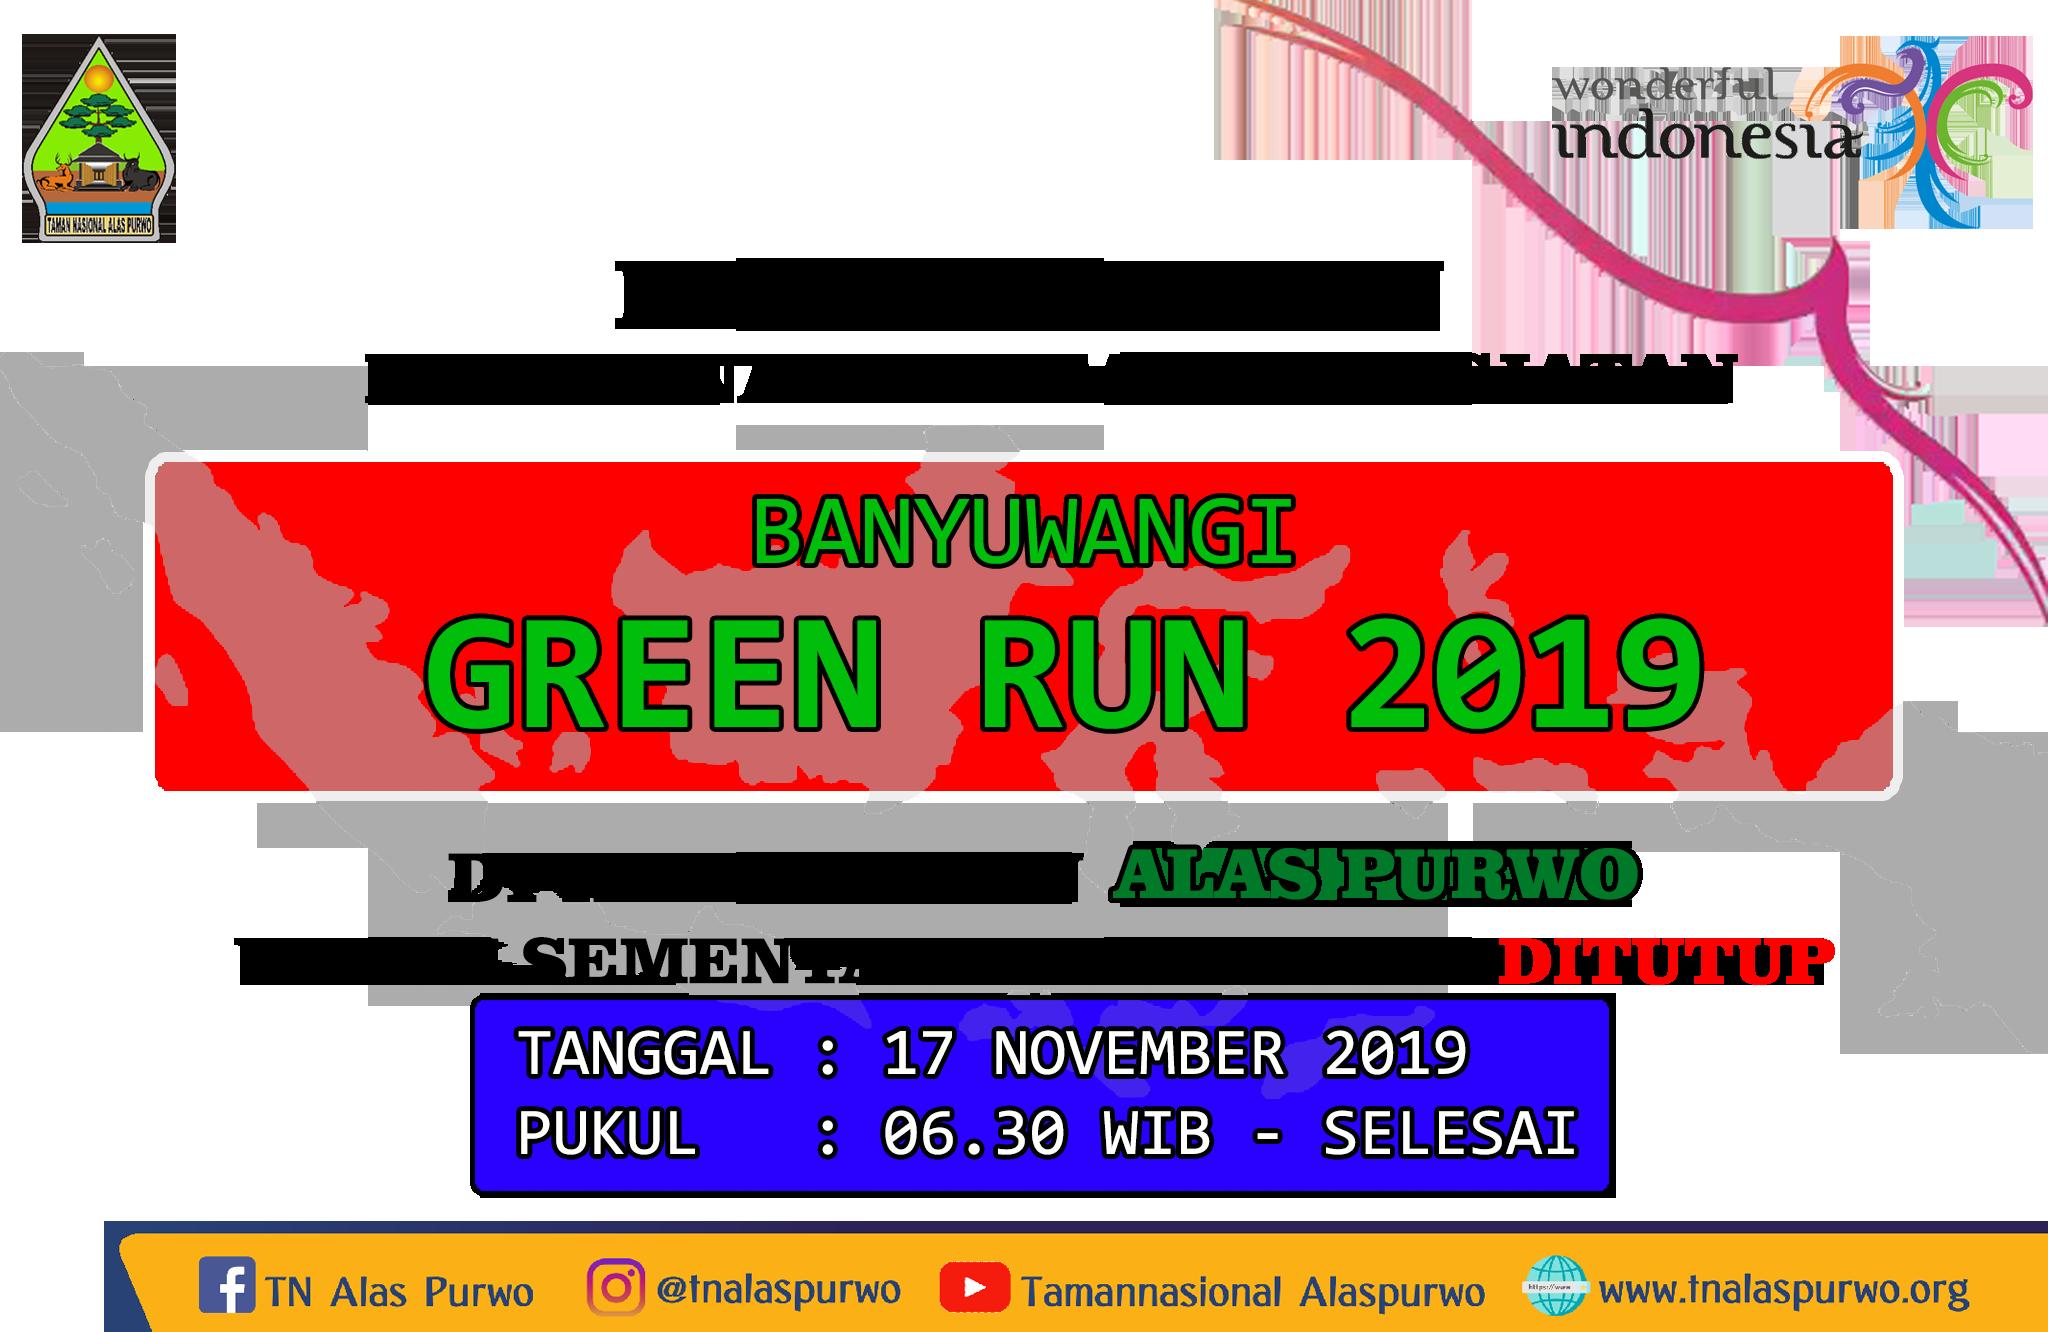 Banyuwangi Green Run 2019 Alas Purwo